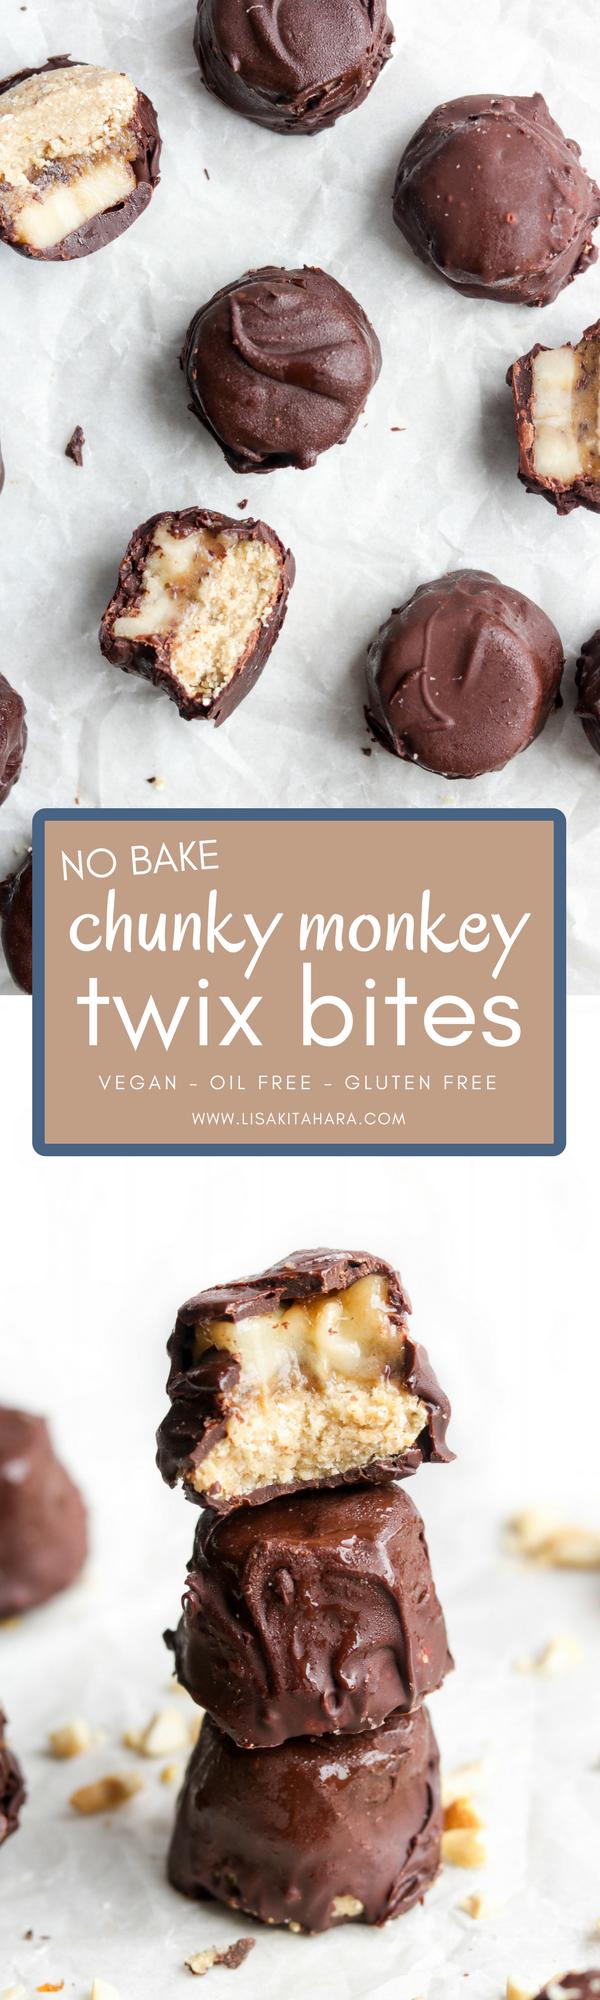 no bake chunky monkey twix bites.png